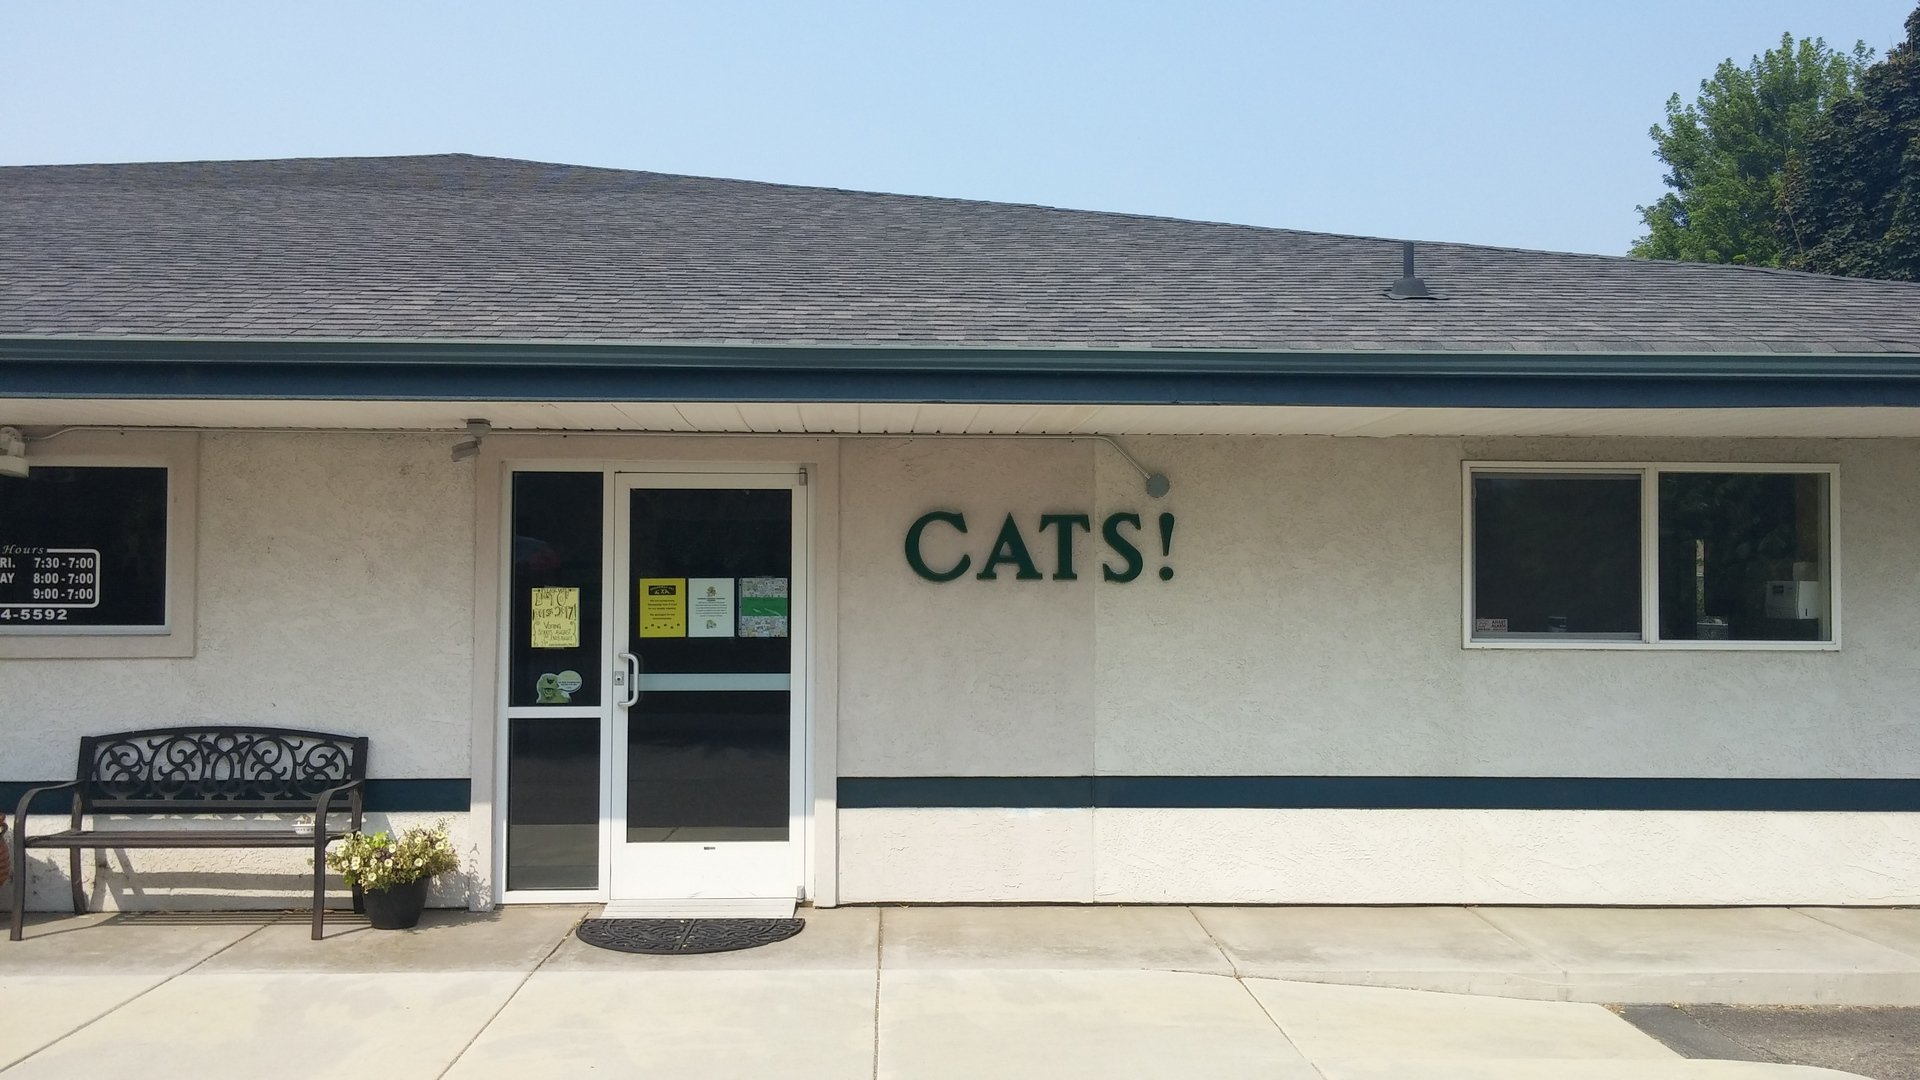 Cat Entrance, Outside of Building, Veterinary Hospital